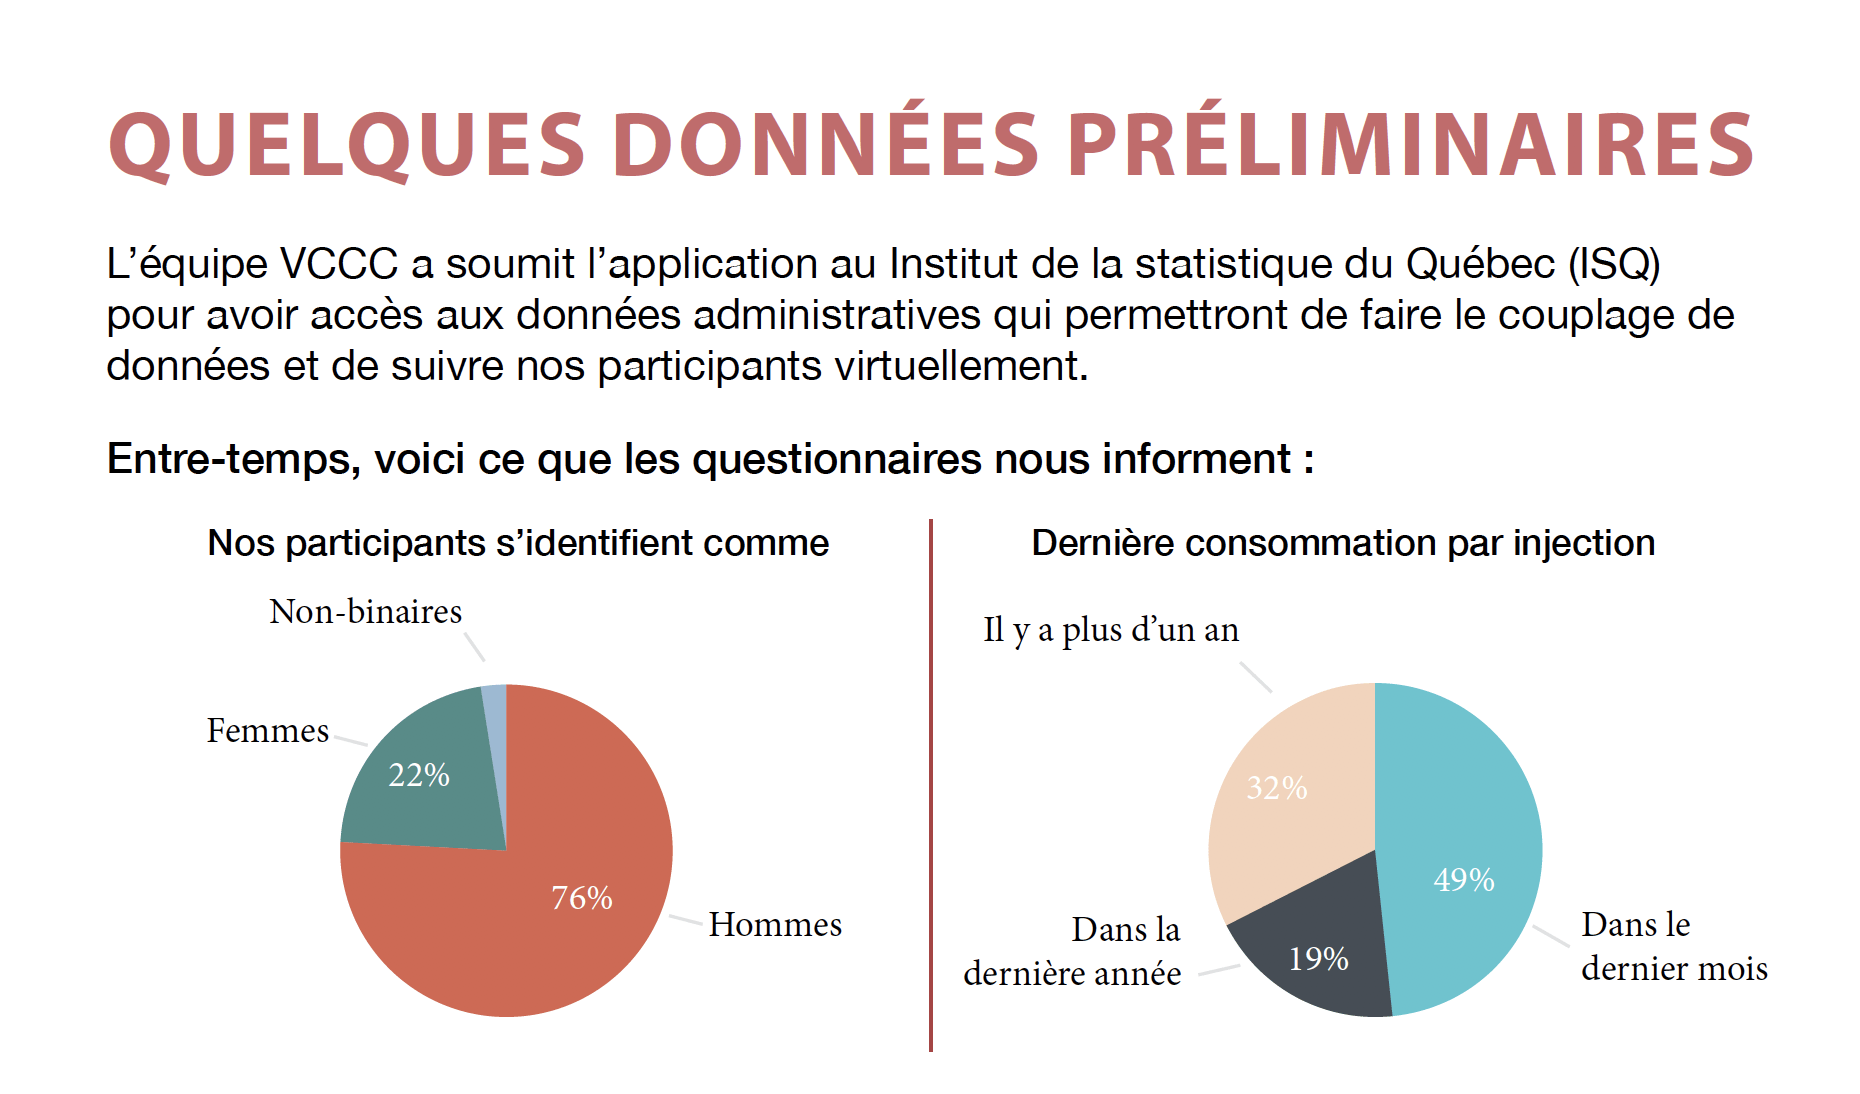 diagramme-circulaire-donnees-preliminaires